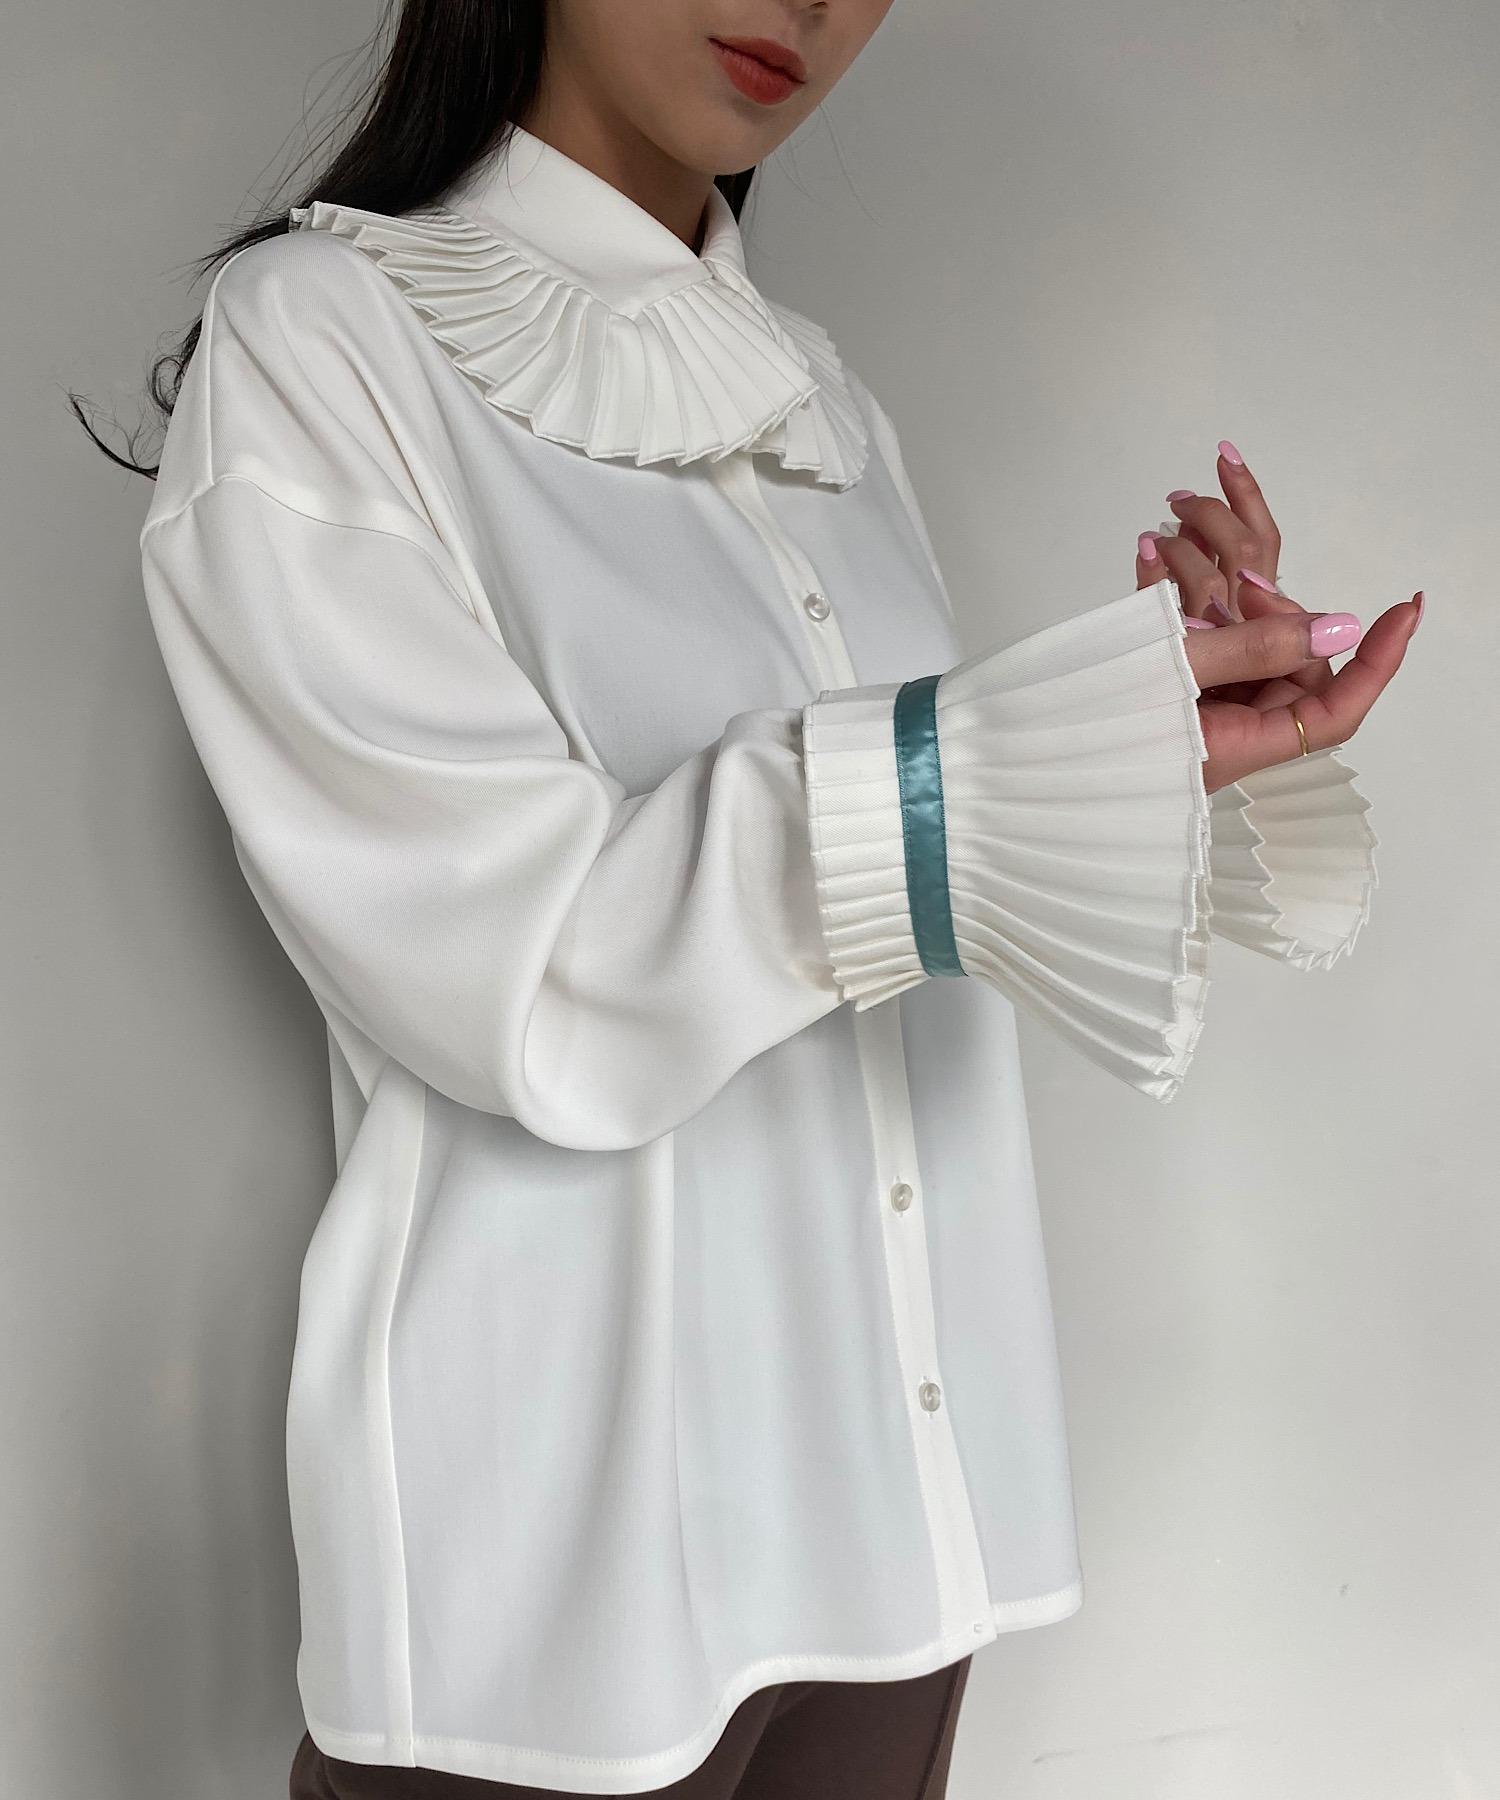 【SANSeLF】frill big collar blouse sanwg1